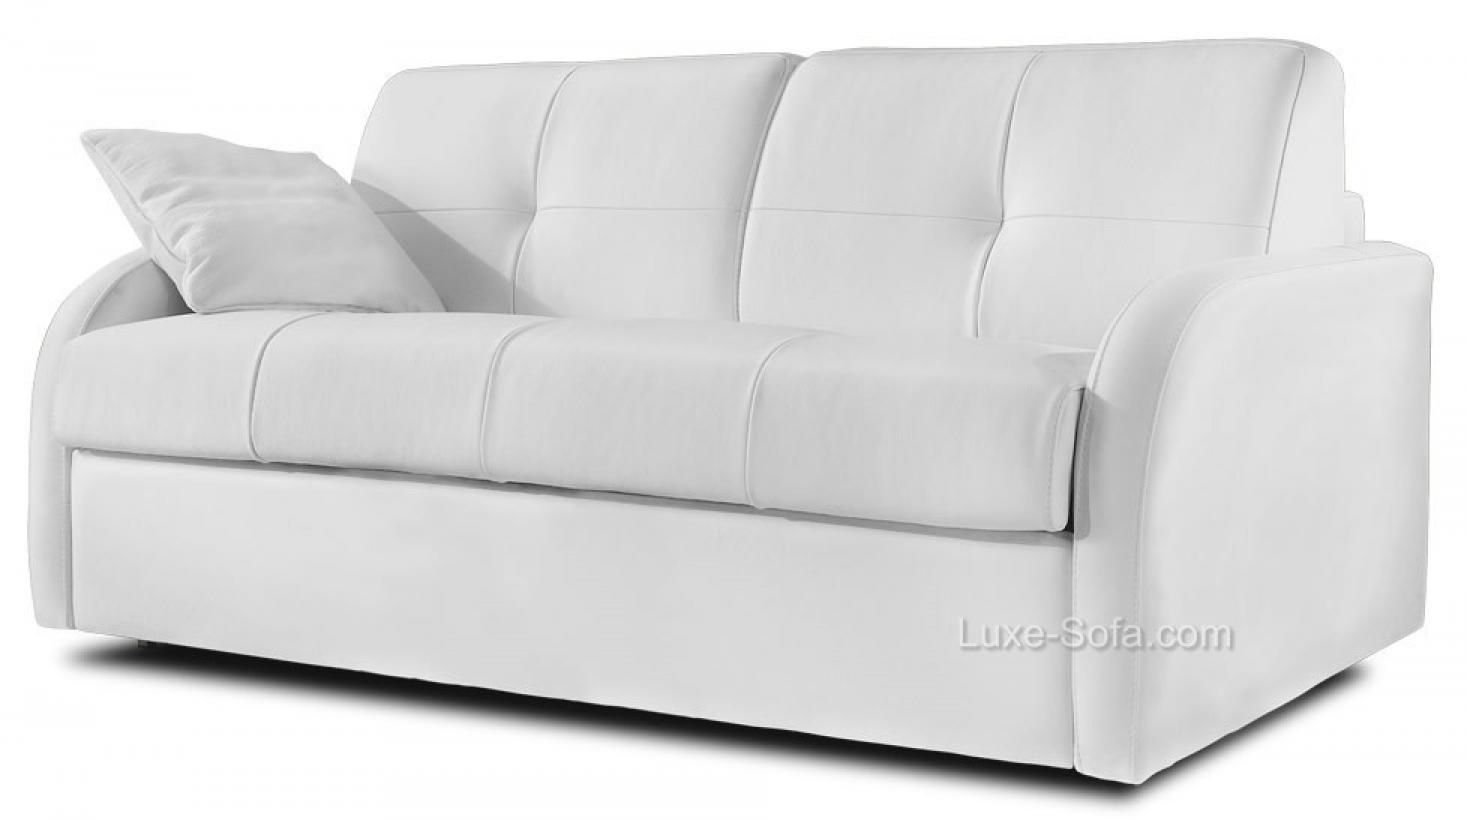 photos canap convertible cuir blanc. Black Bedroom Furniture Sets. Home Design Ideas